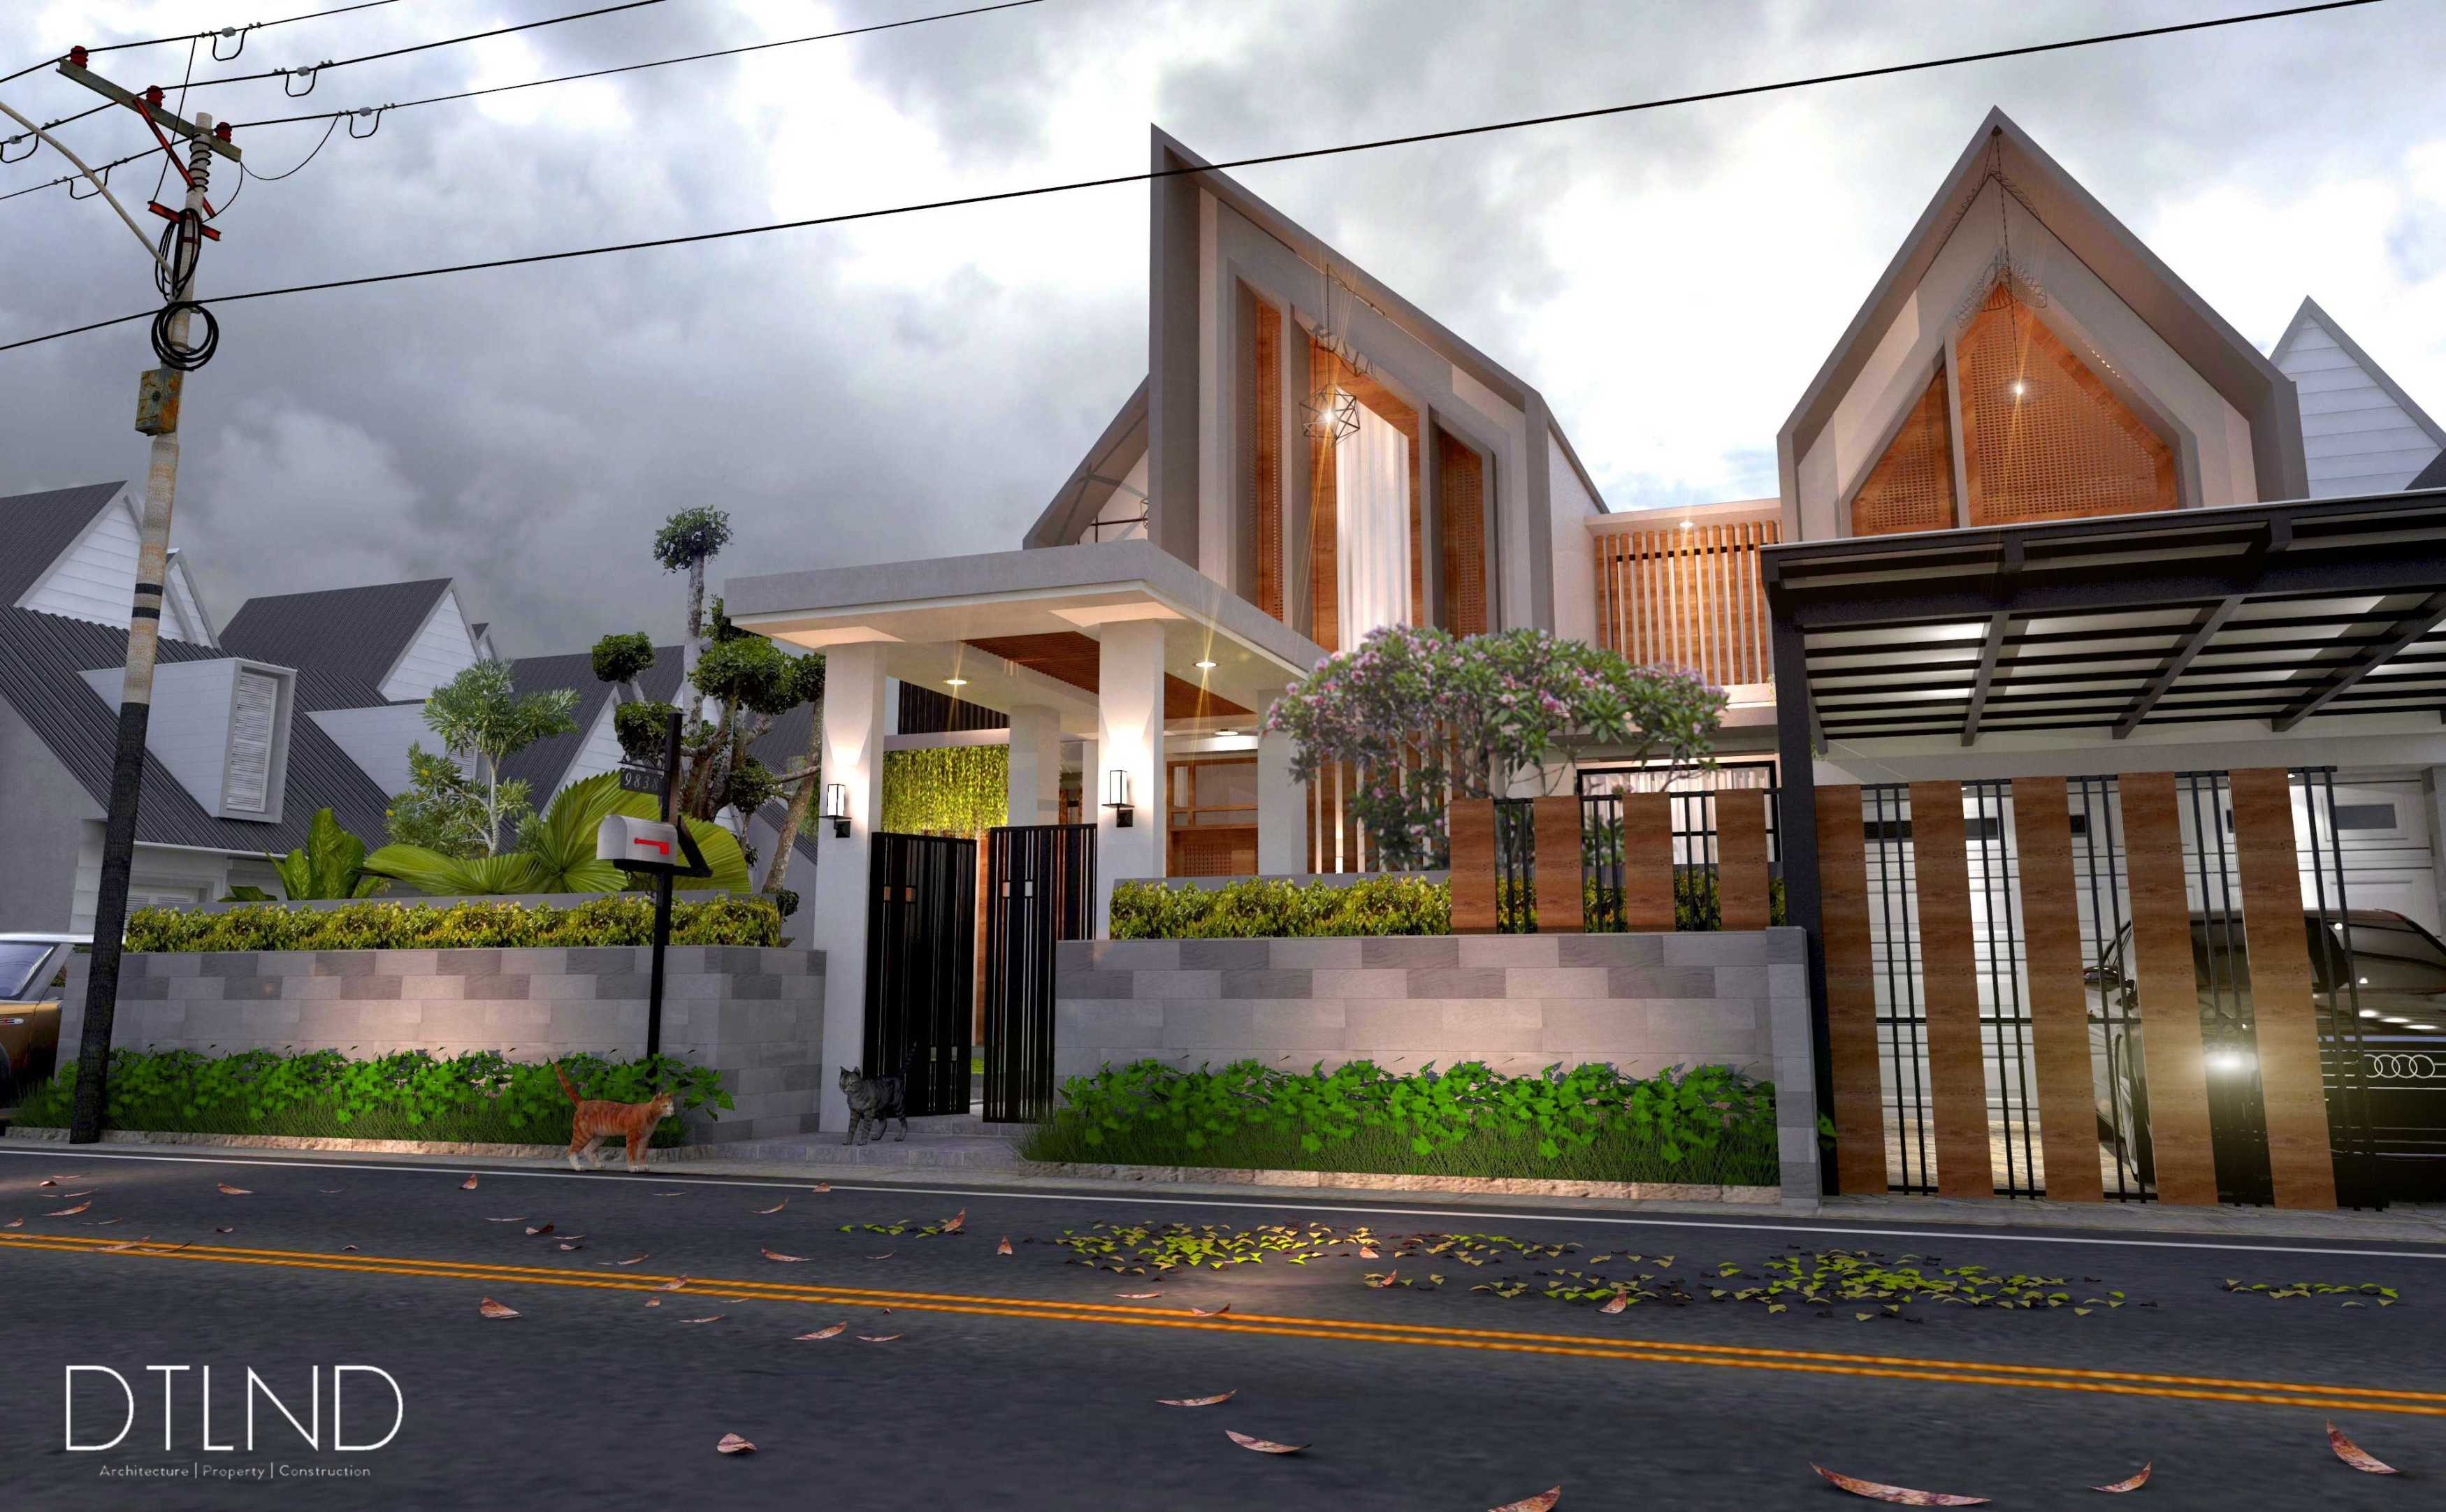 Dutaland Villa Setia Budi Kota Medan, Sumatera Utara, Indonesia Kota Medan, Sumatera Utara, Indonesia Villa Setia Budi - Facade   41535